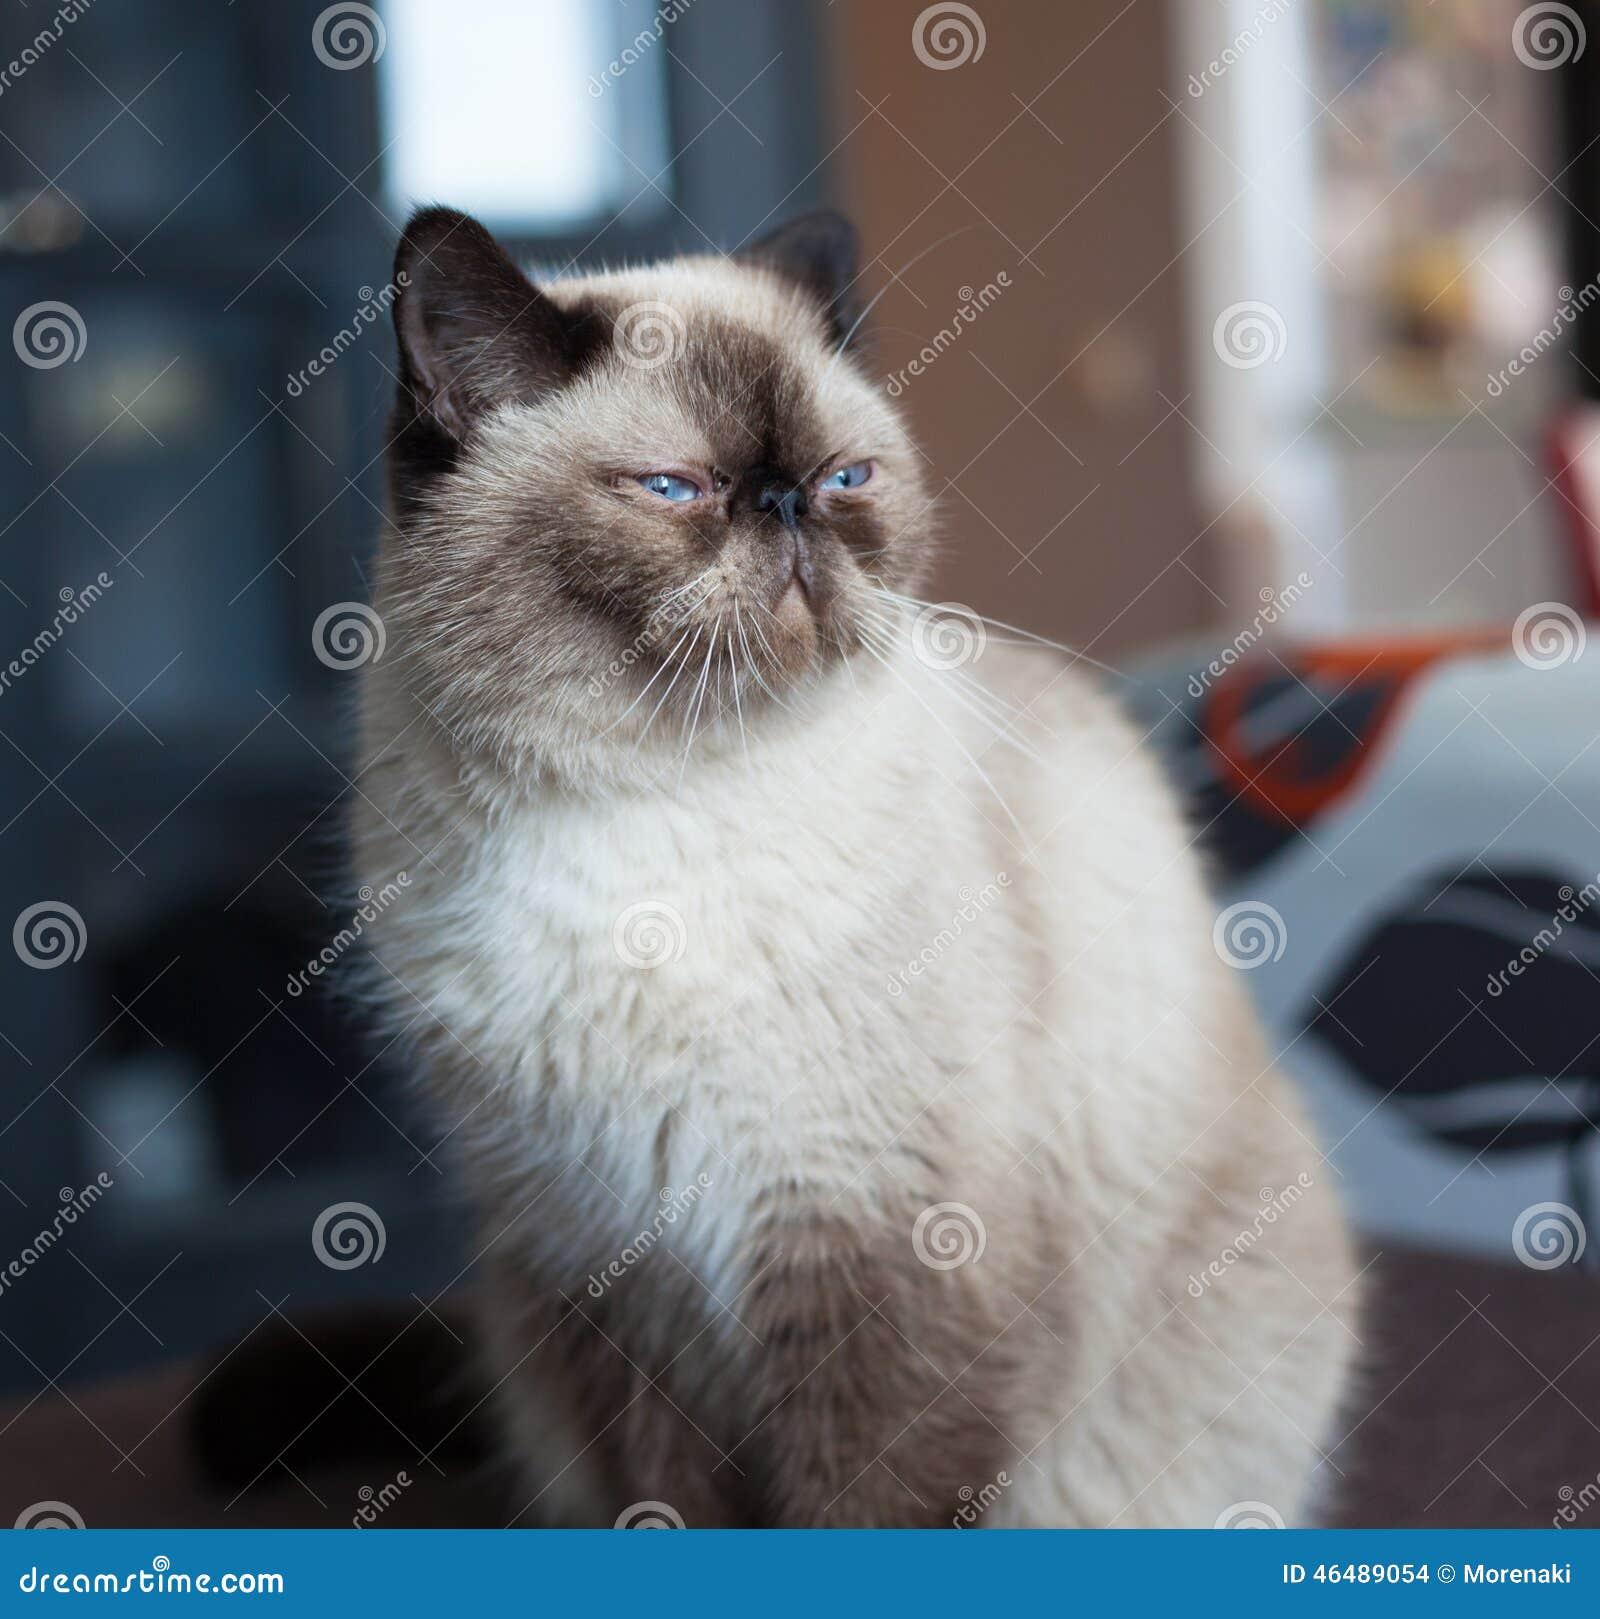 Exotic cat breed